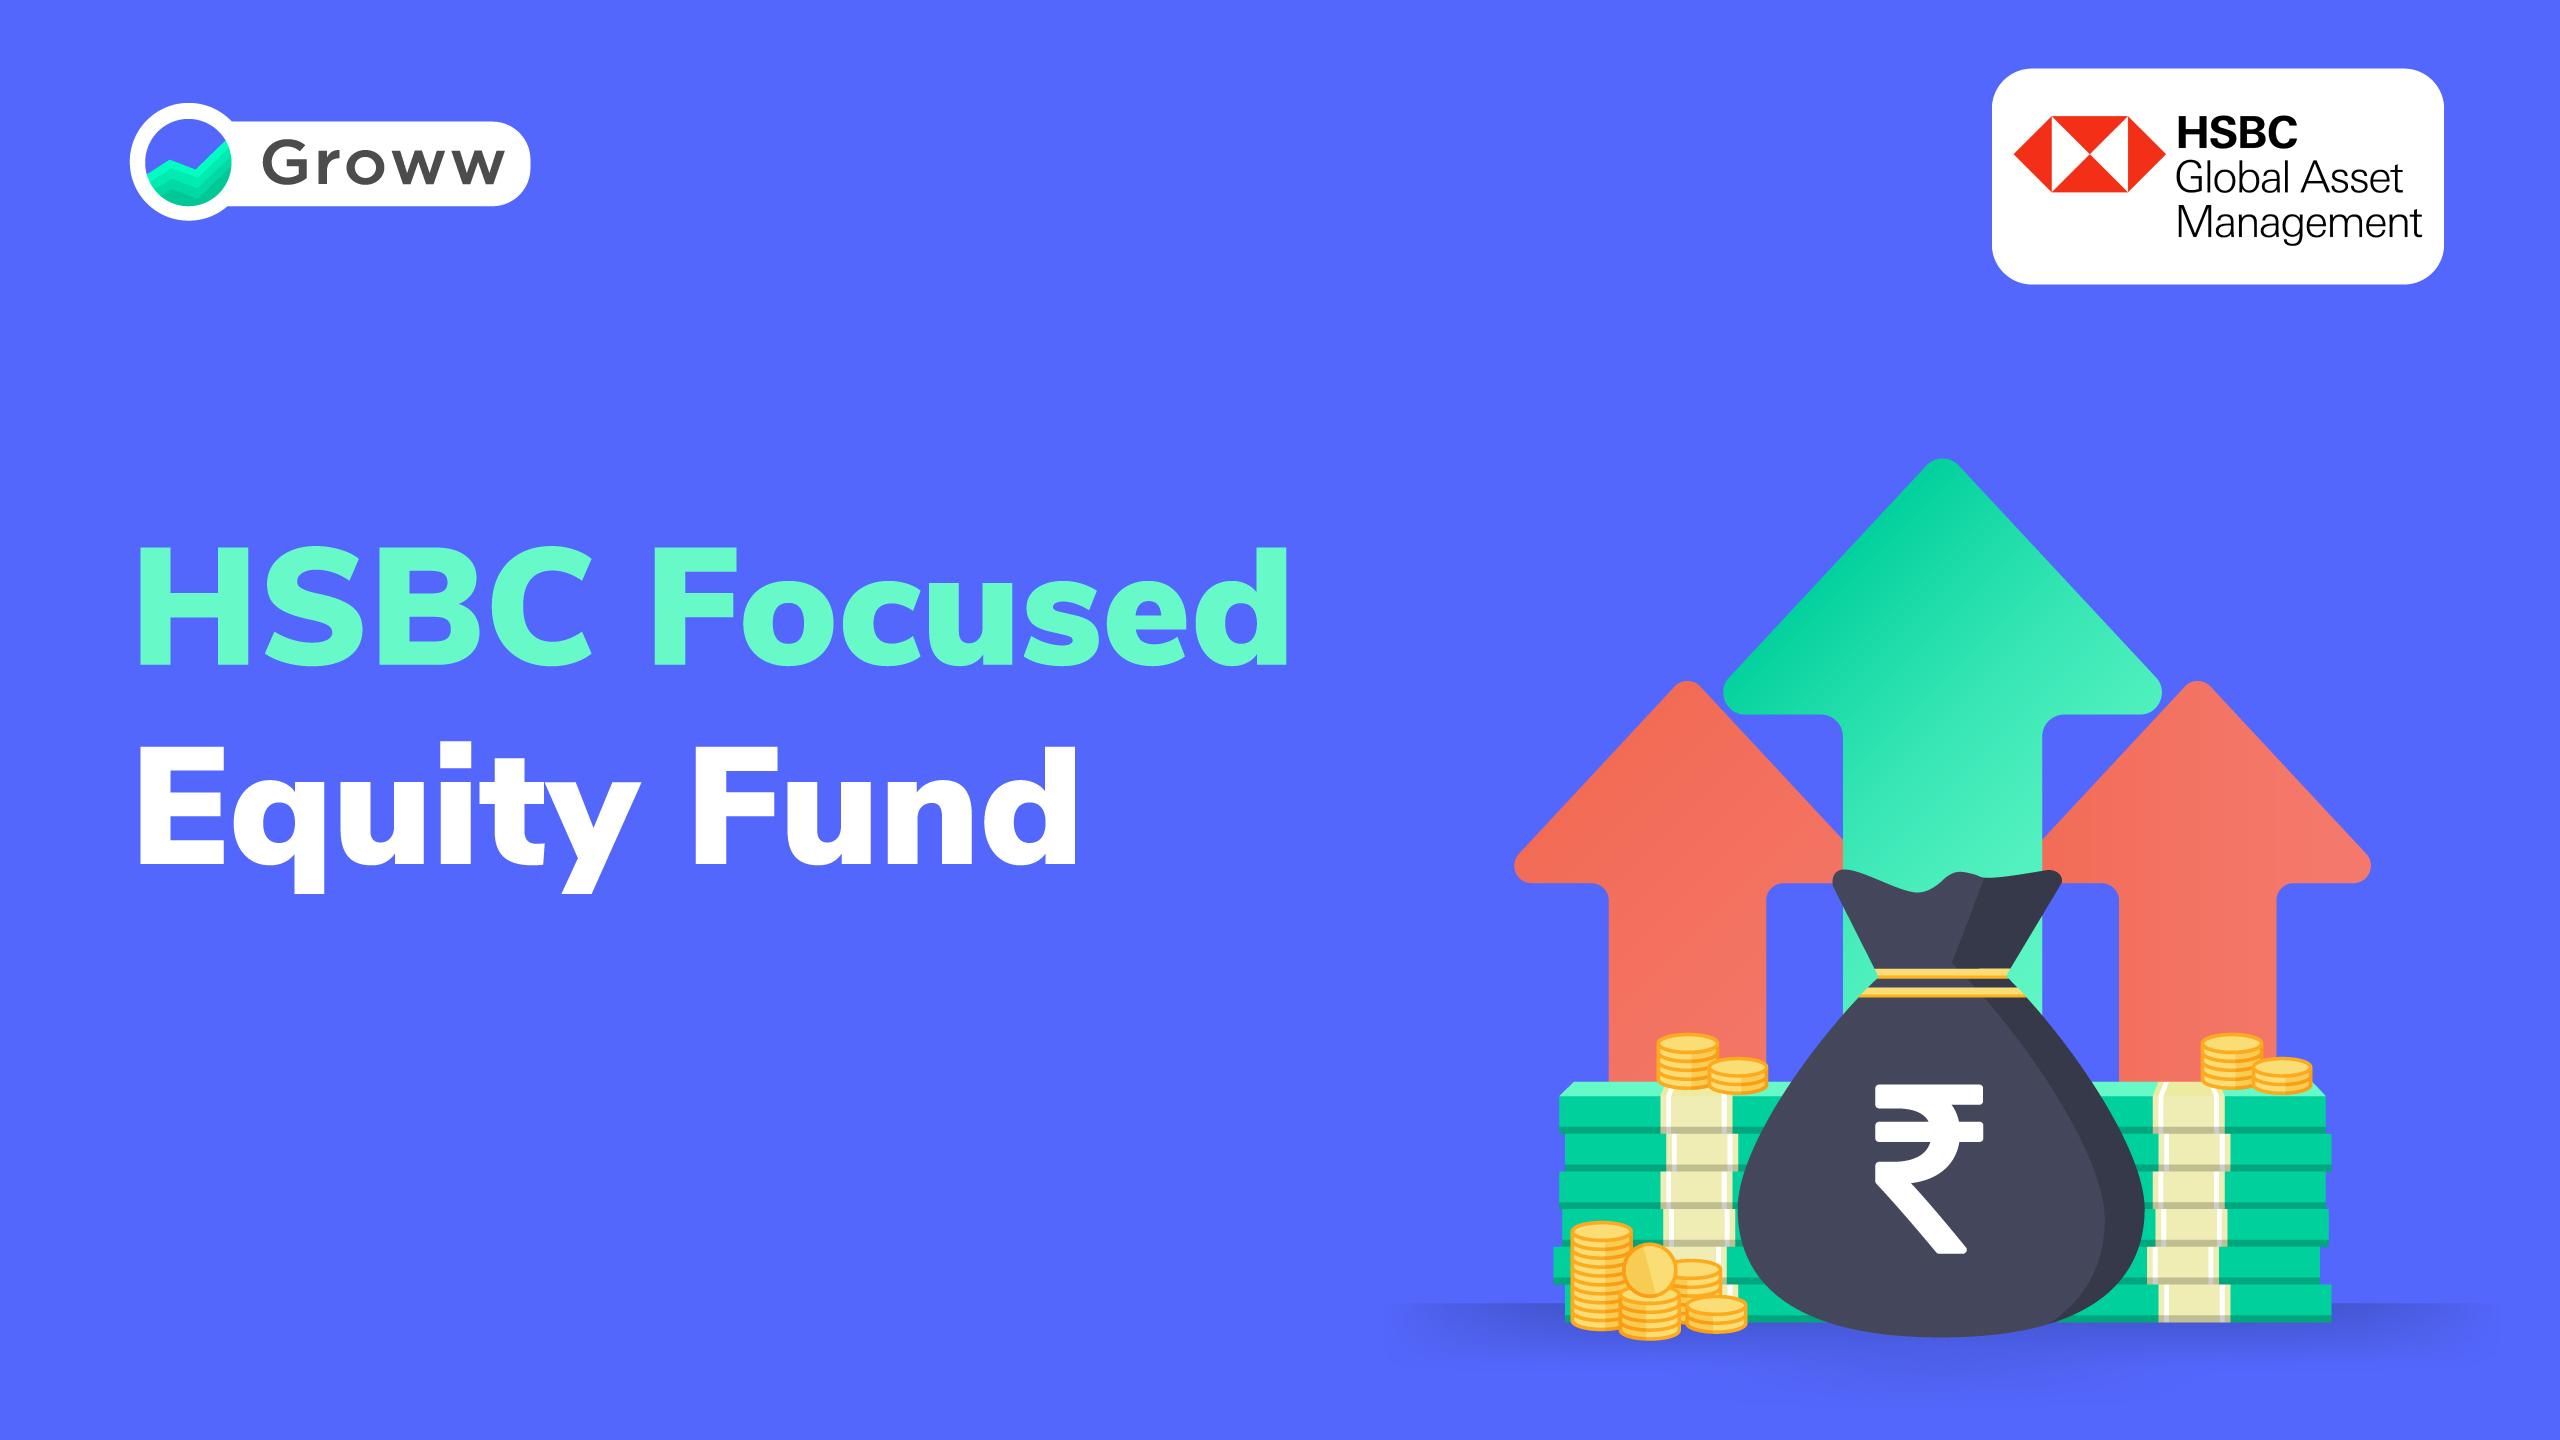 HSBC Focused Equity Fund